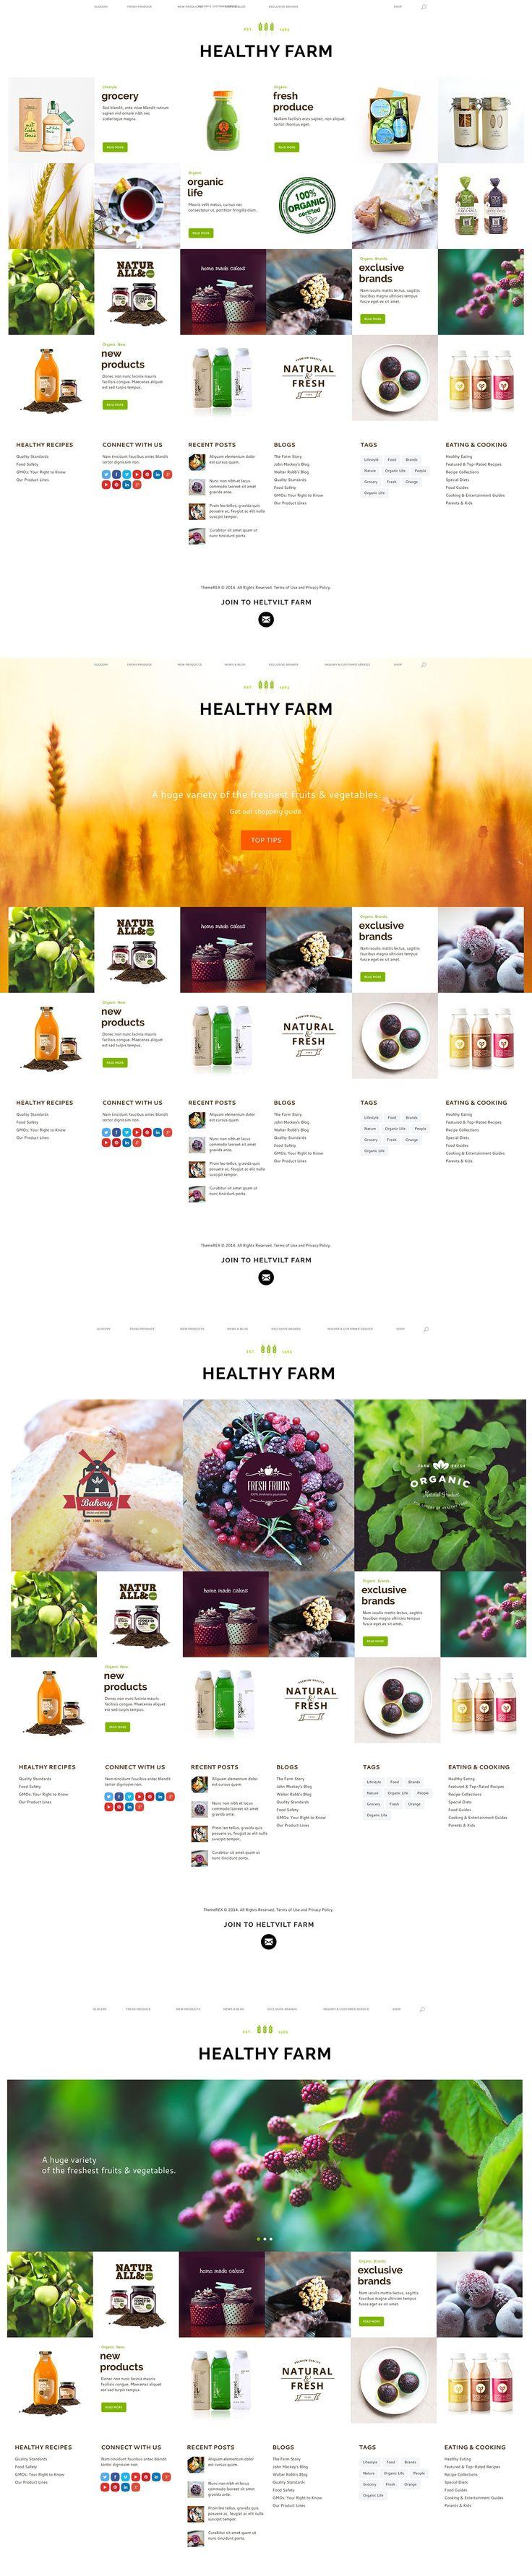 Интернет-магазин эко продуктов. Web design, веб дизайн, e-commerce.